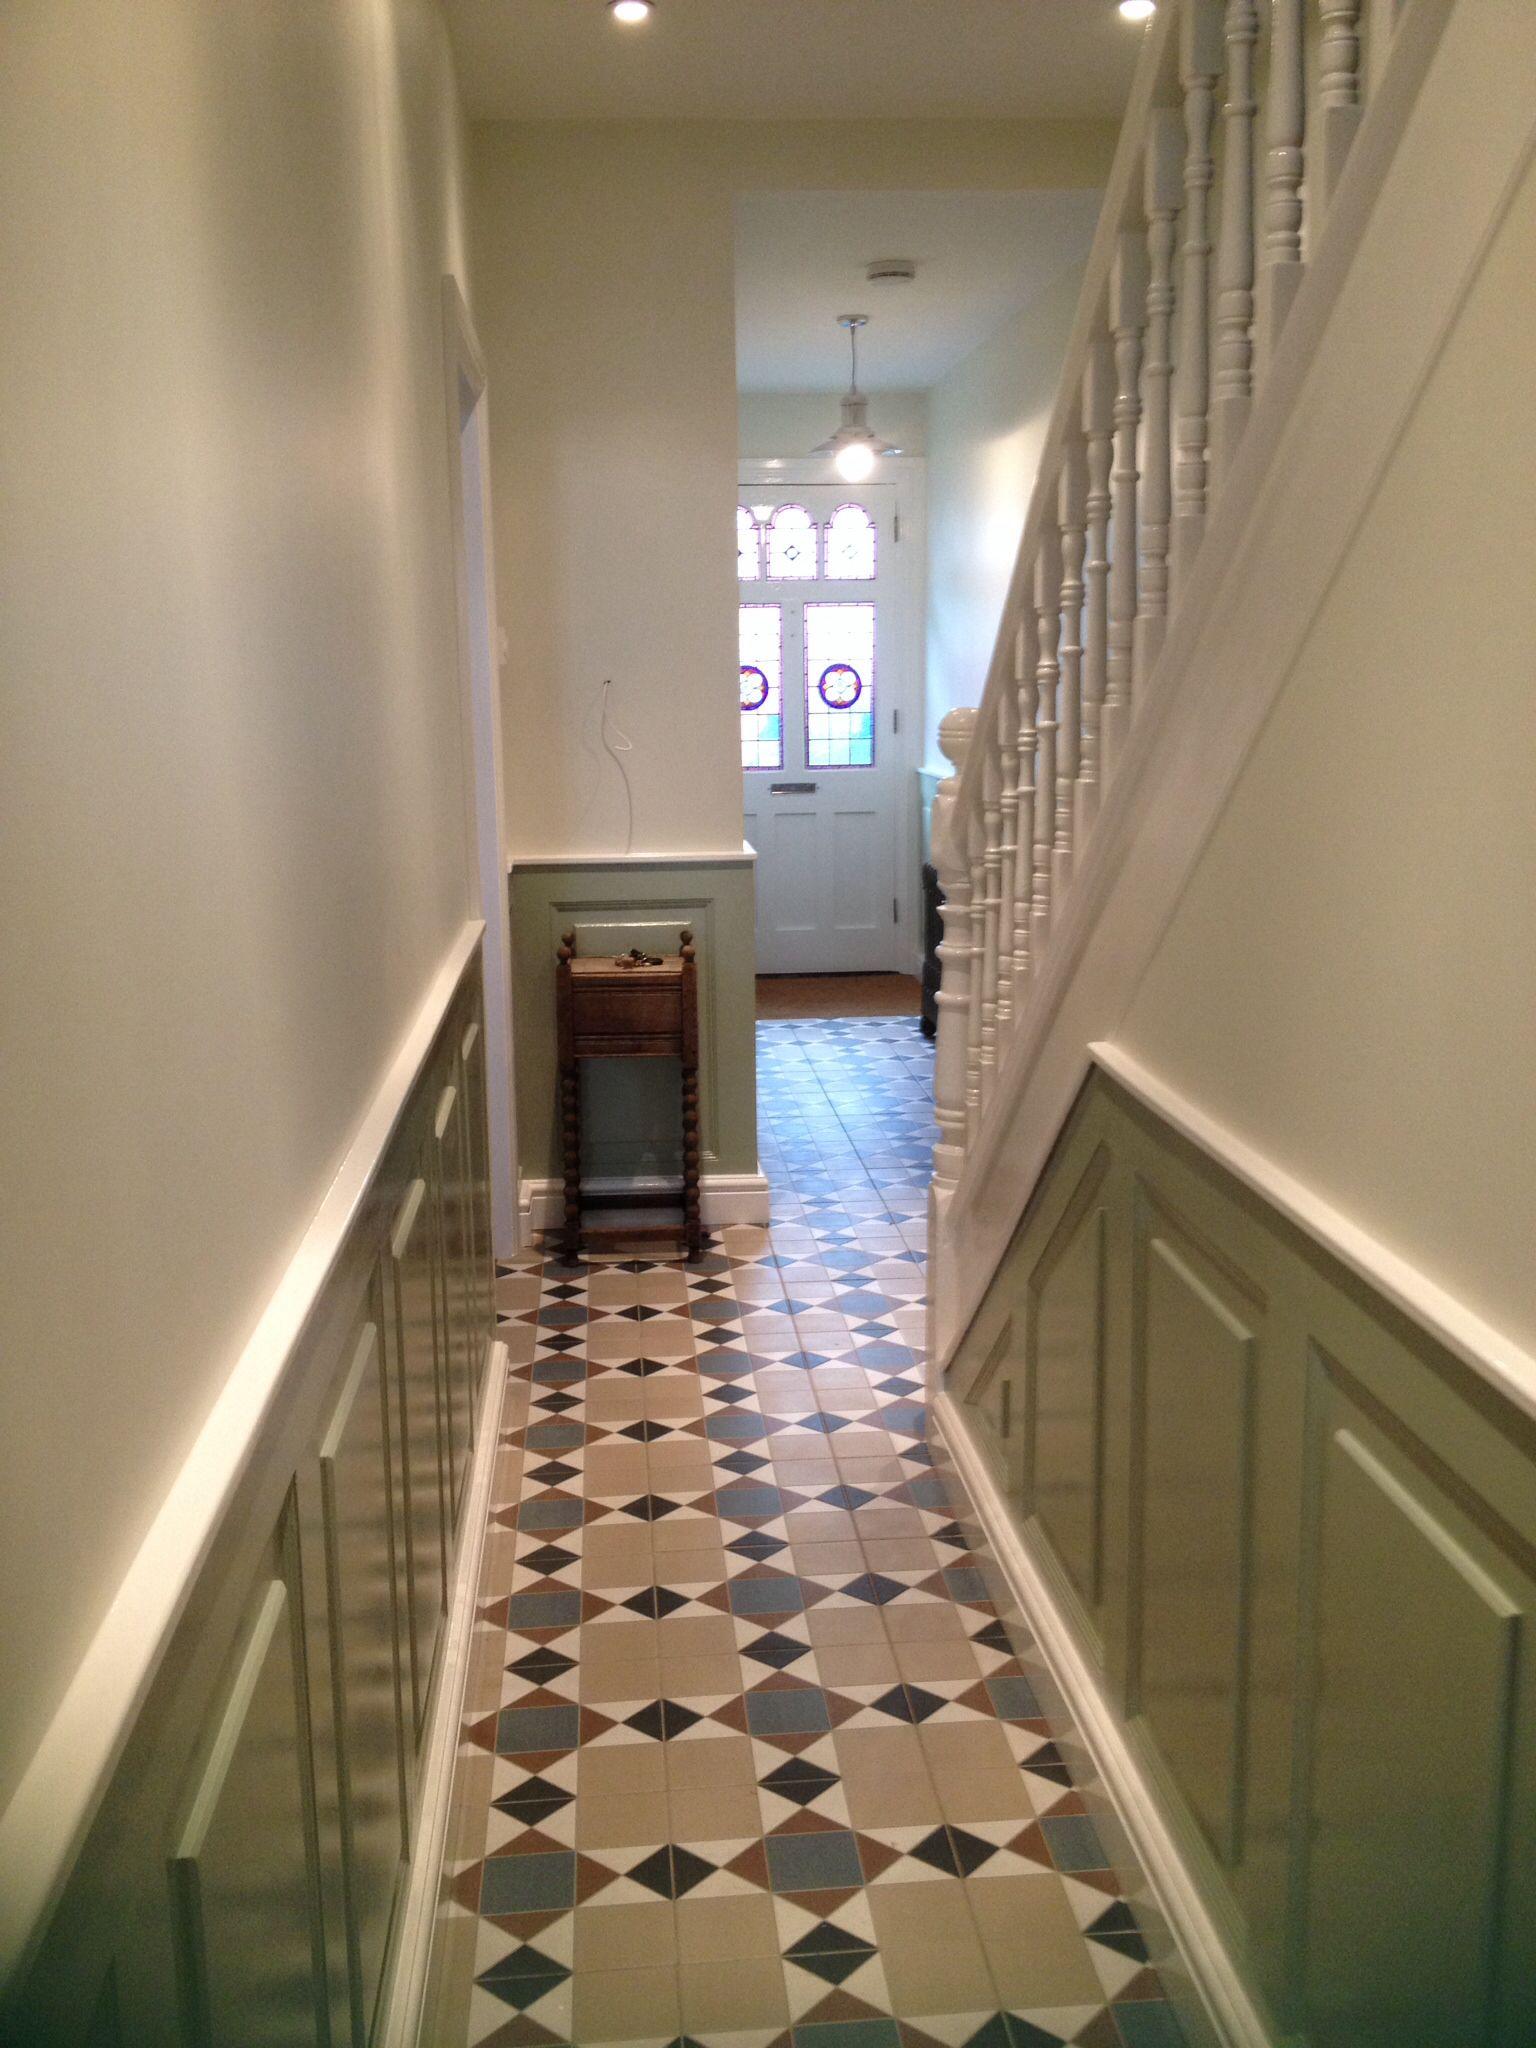 Our hallway grosvenor floor tiles topps tiles james white our hallway grosvenor floor tiles topps tiles james white vert de terre dailygadgetfo Images